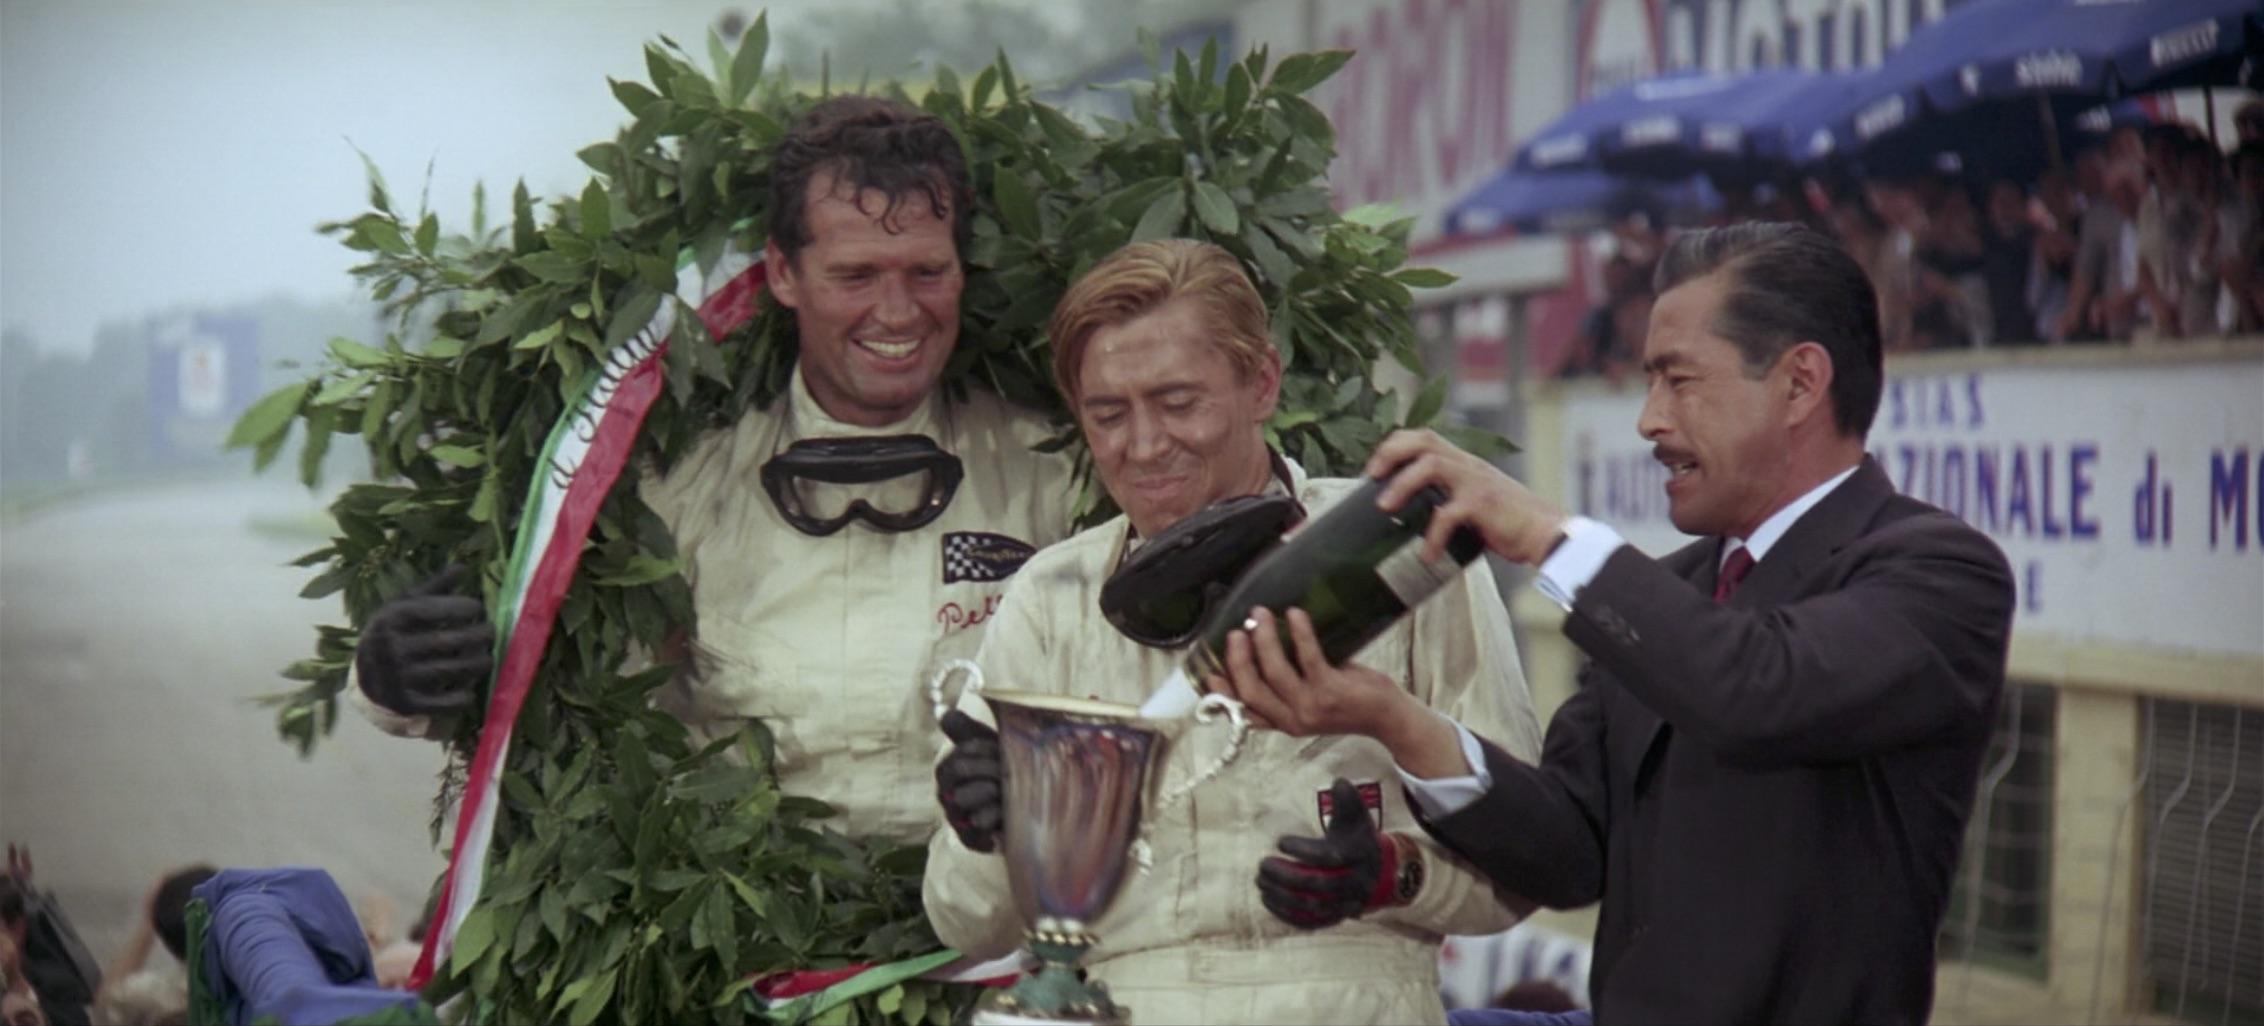 Grand Prix Race Finish